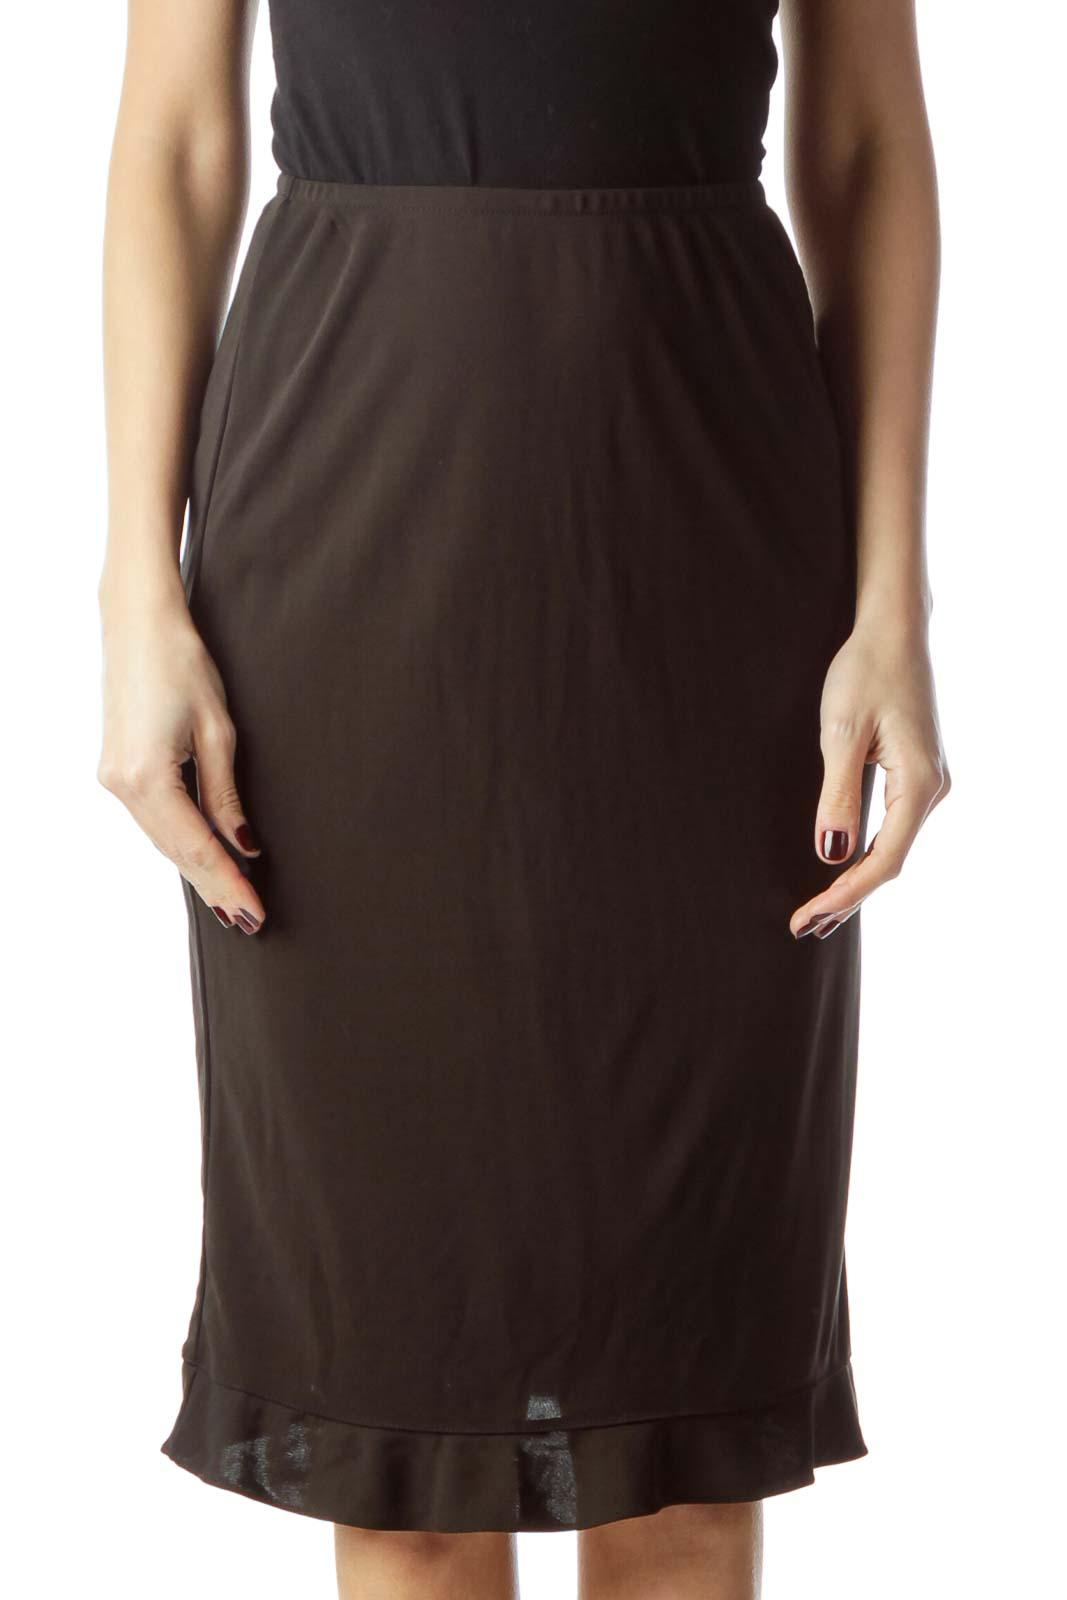 Black Stretch Midi Flared Skirt Front